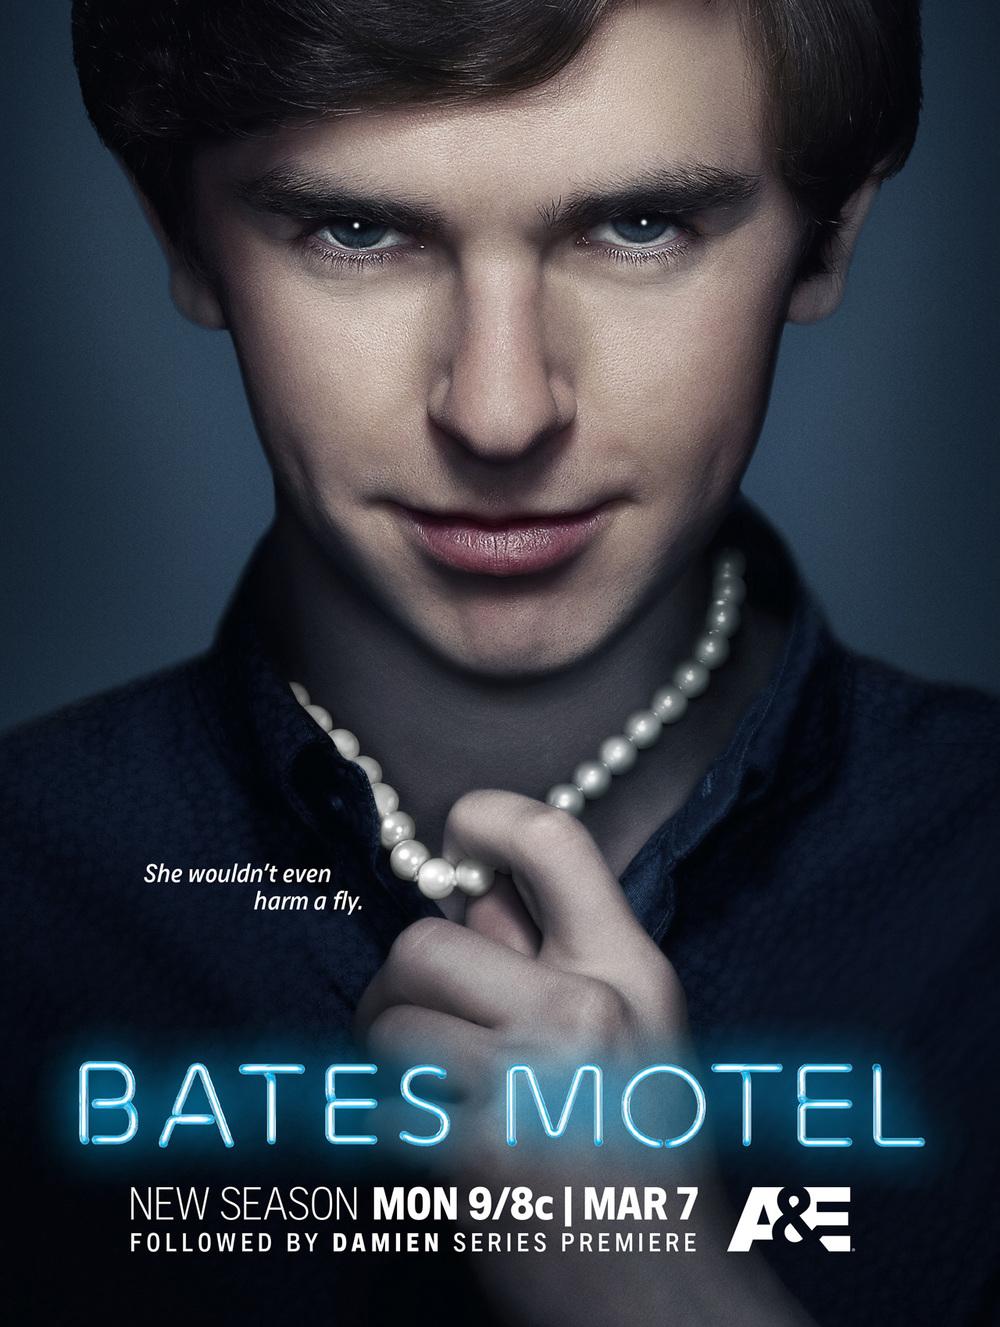 4. Bates Motel (A&E)